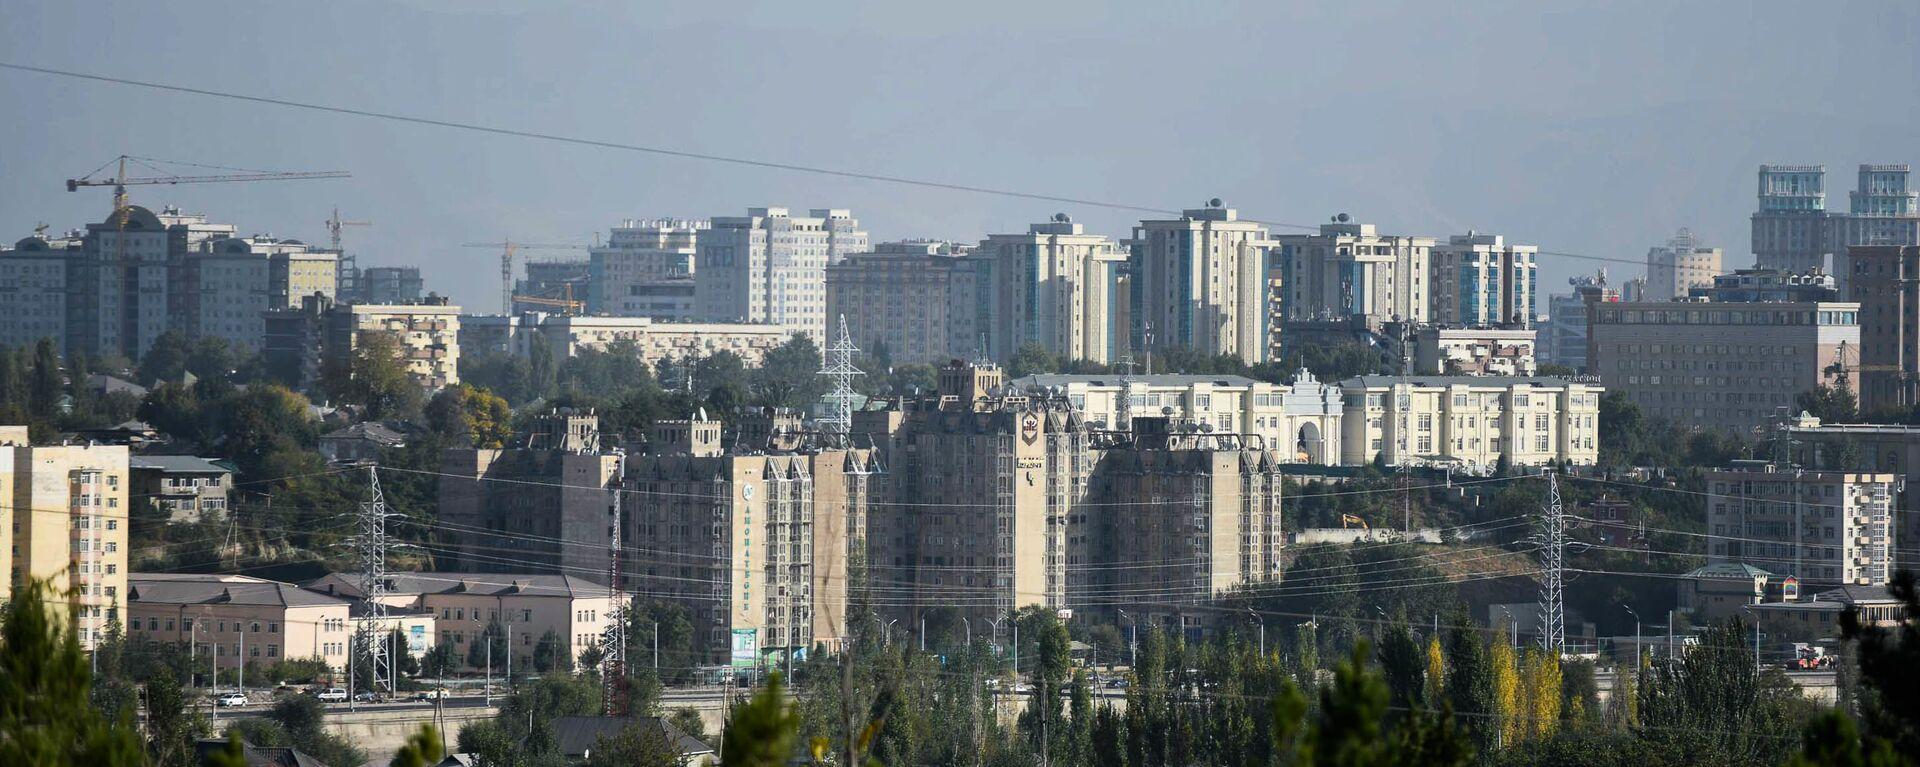 Вид на город Душанбе, архивное фото - Sputnik Тоҷикистон, 1920, 23.09.2021